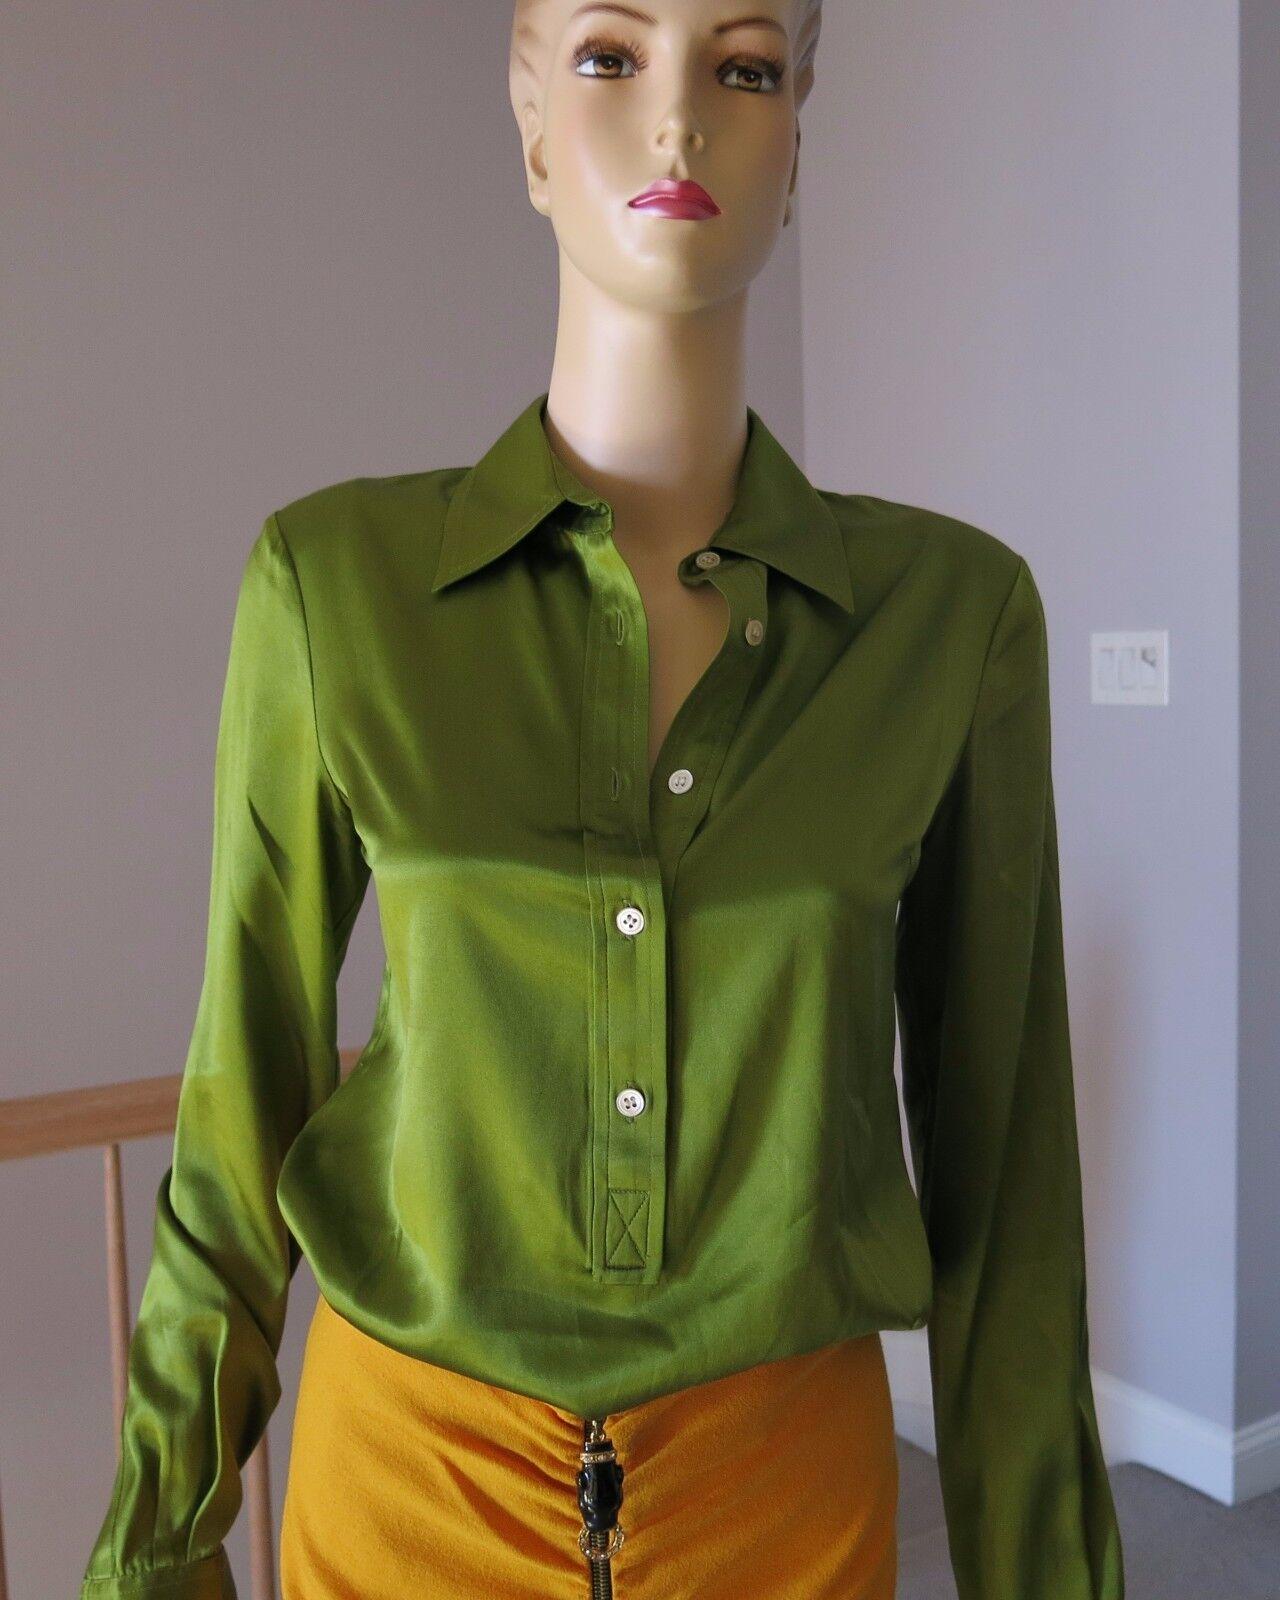 KUSLON Grün Tunic Größe S